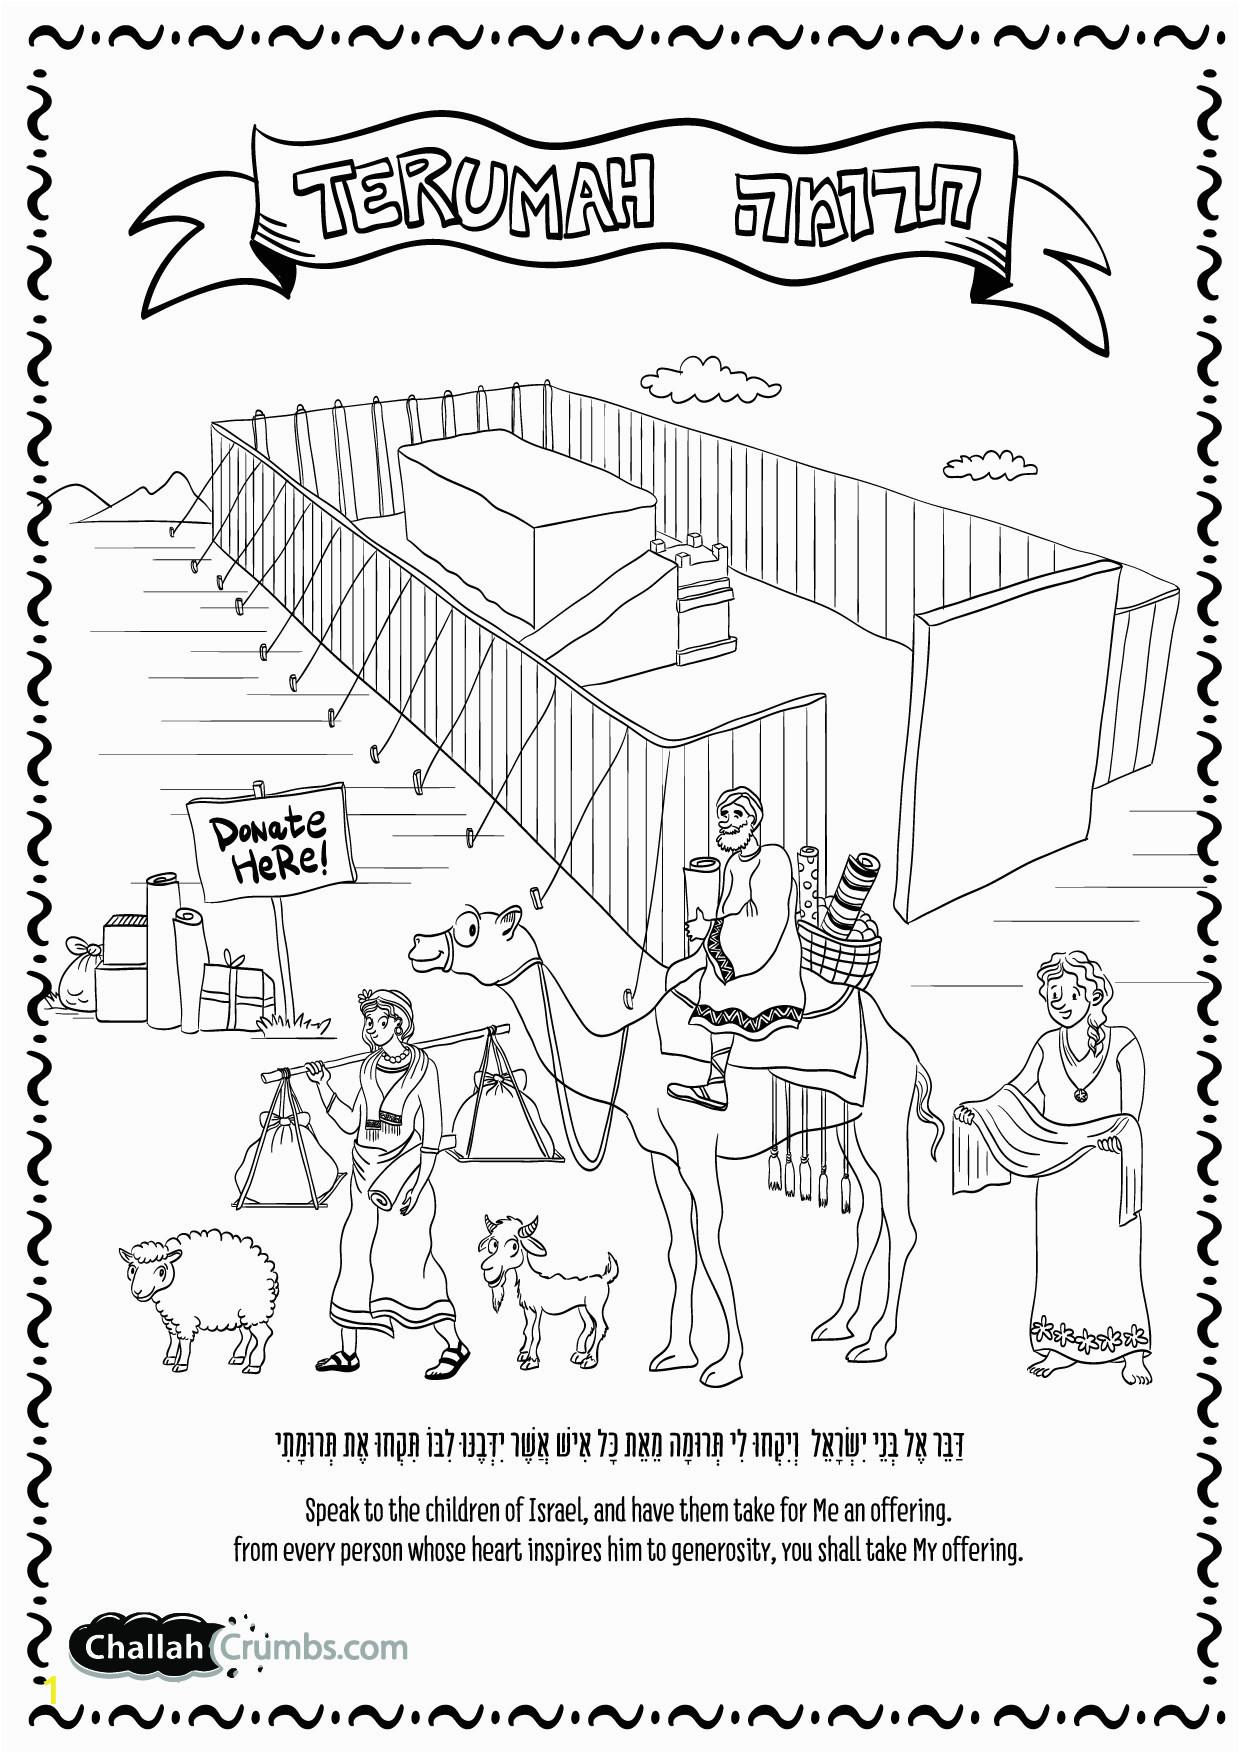 tabernacle drawing